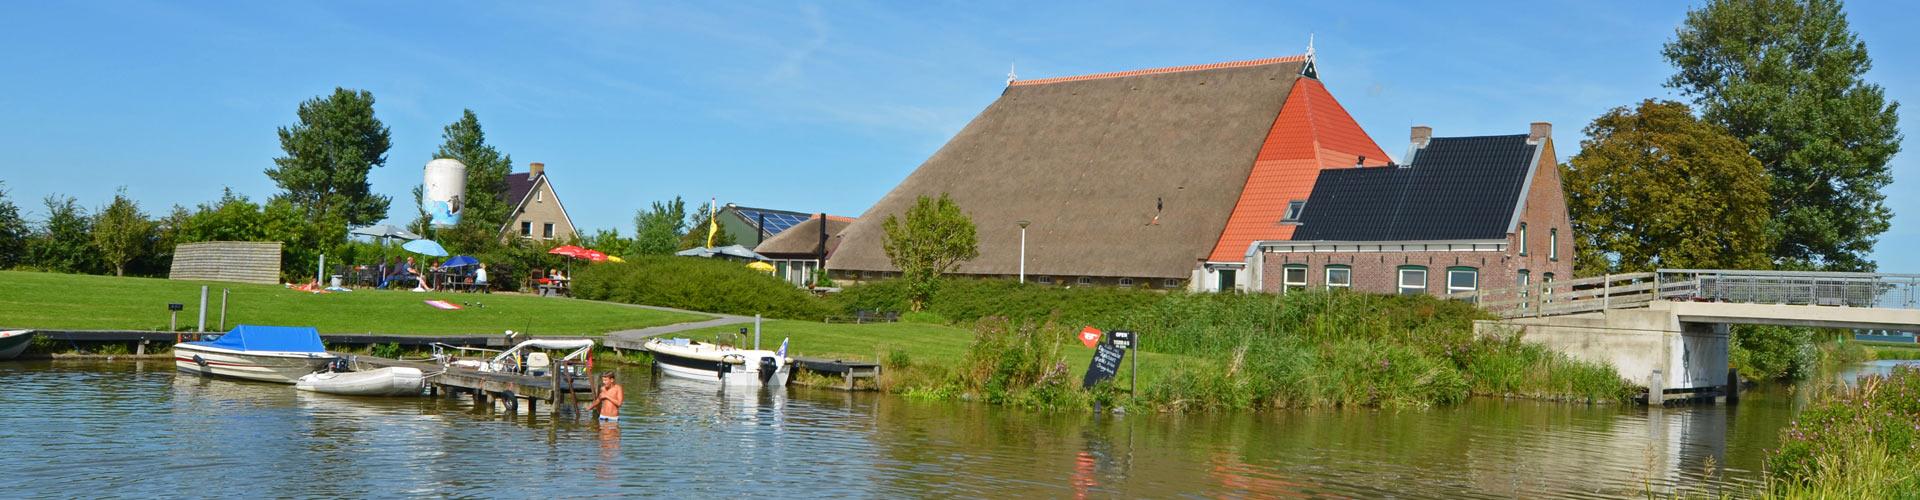 blikvaart-groepsaccommodatie-boerderijcamping-camping aan het water-vakantiewoning-friesland